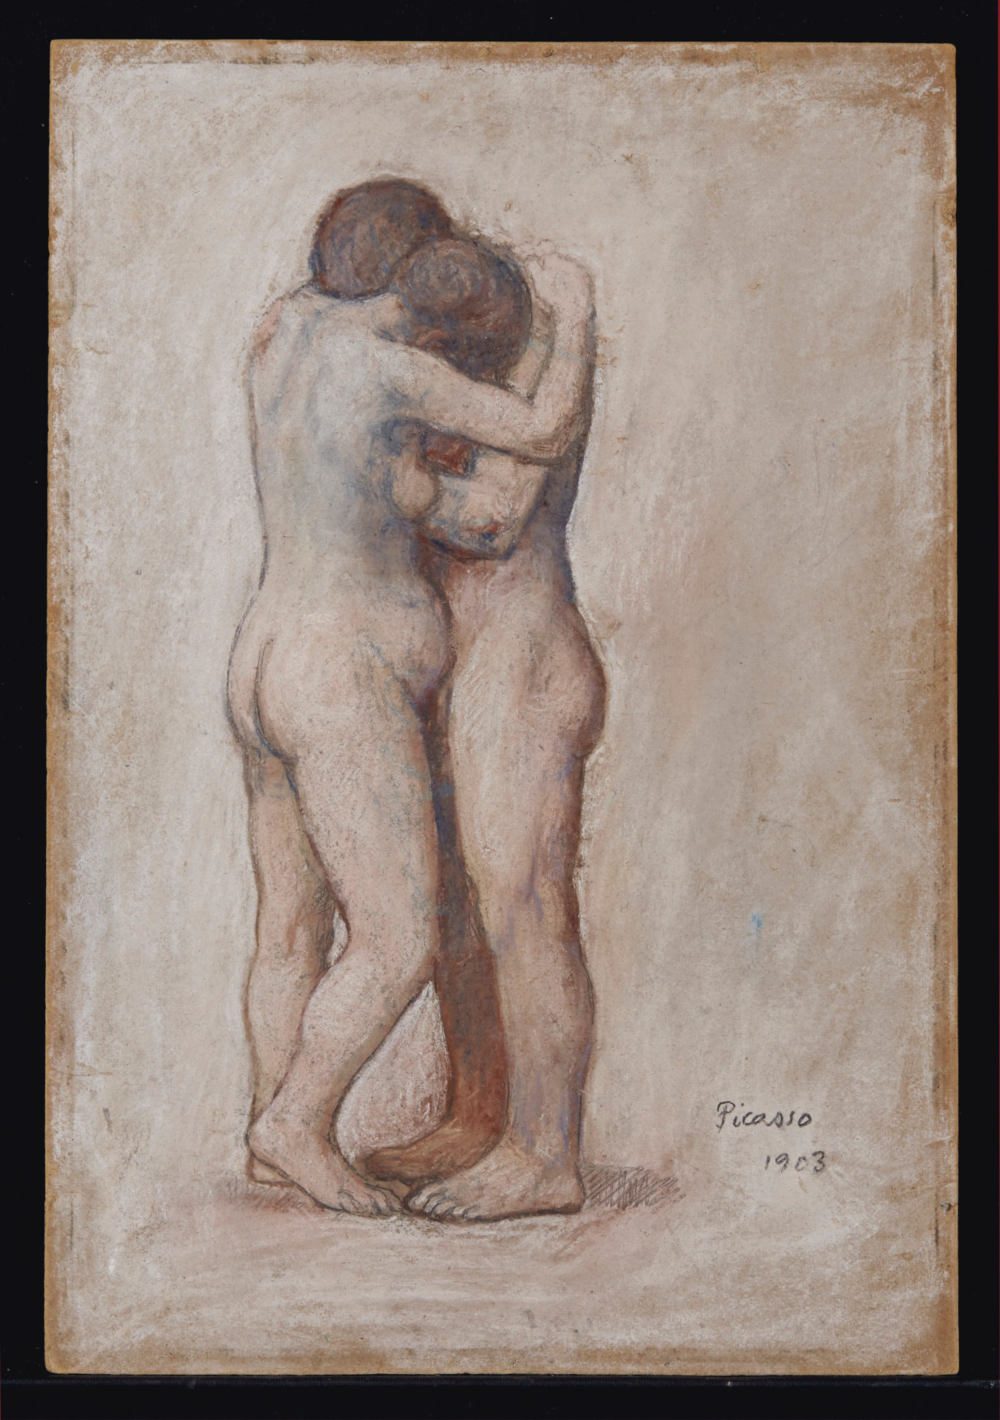 Pablo Picasso, L'étreinte, 1903. Pastel and black chalk on masonite 37.2 x 25.5 cm / 14 5/8 x 10 in. Courtesy of Christie's © Succession Picasso / 2019, ProLitteris, Zurich